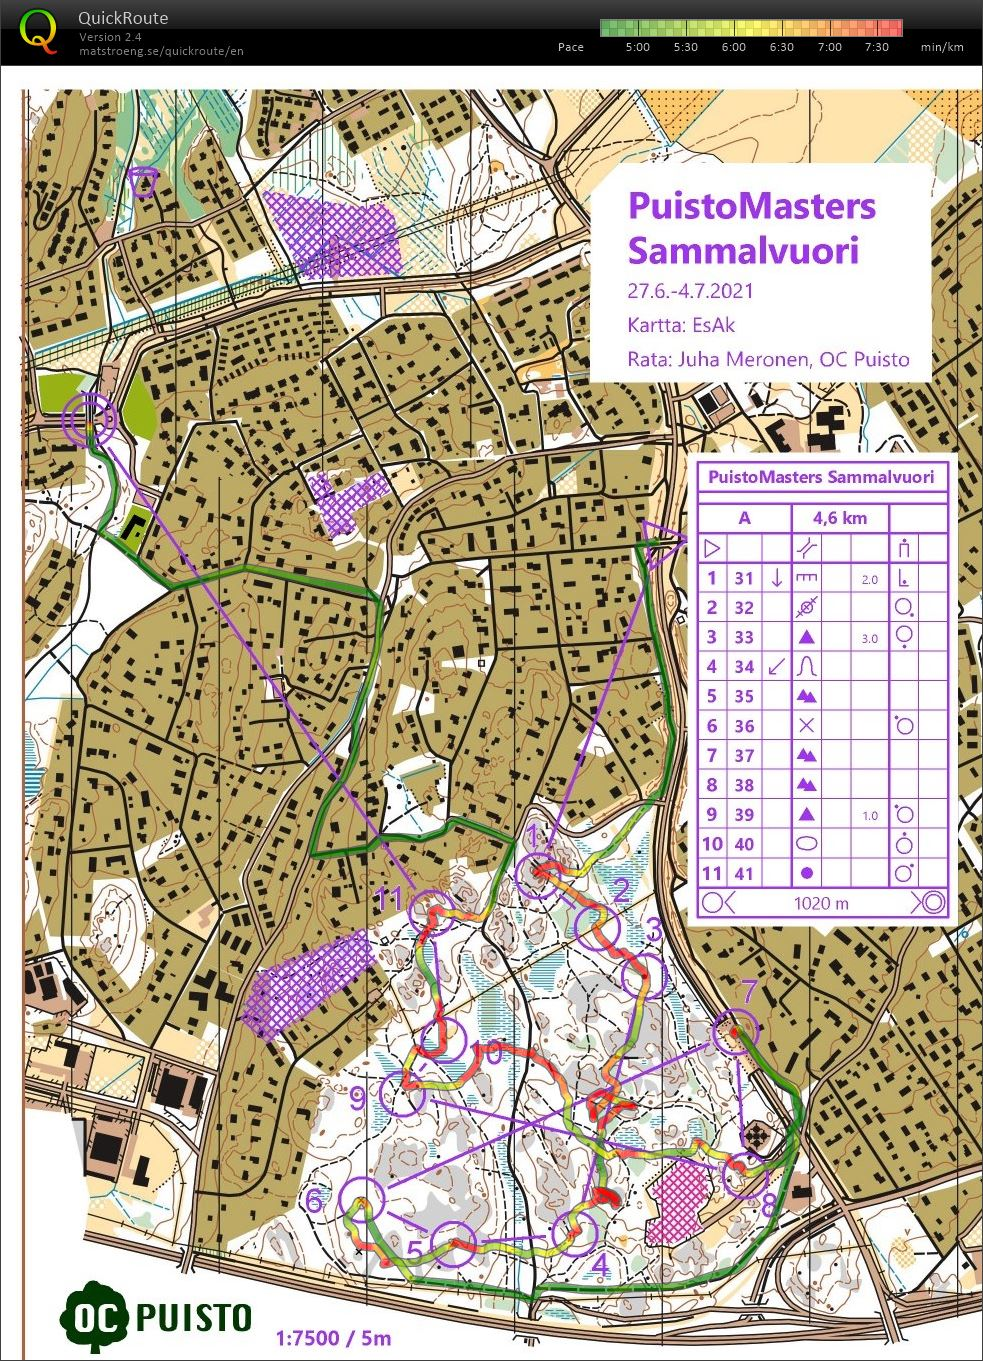 PuistoMasters Sammalvuori (01/07/2021)